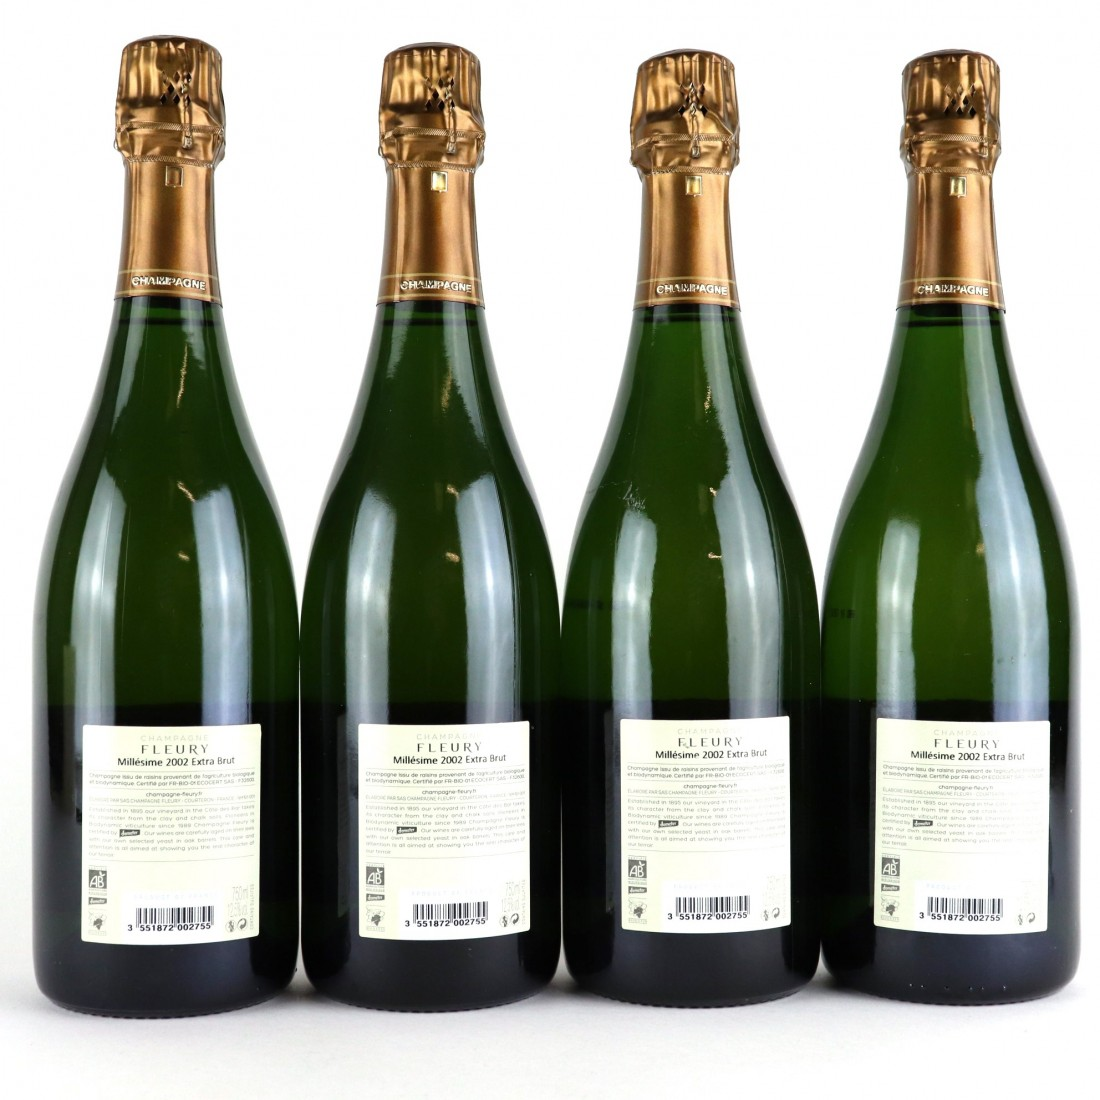 Fleury Extra Brut 2002 Vintage Champagne 4x75cl